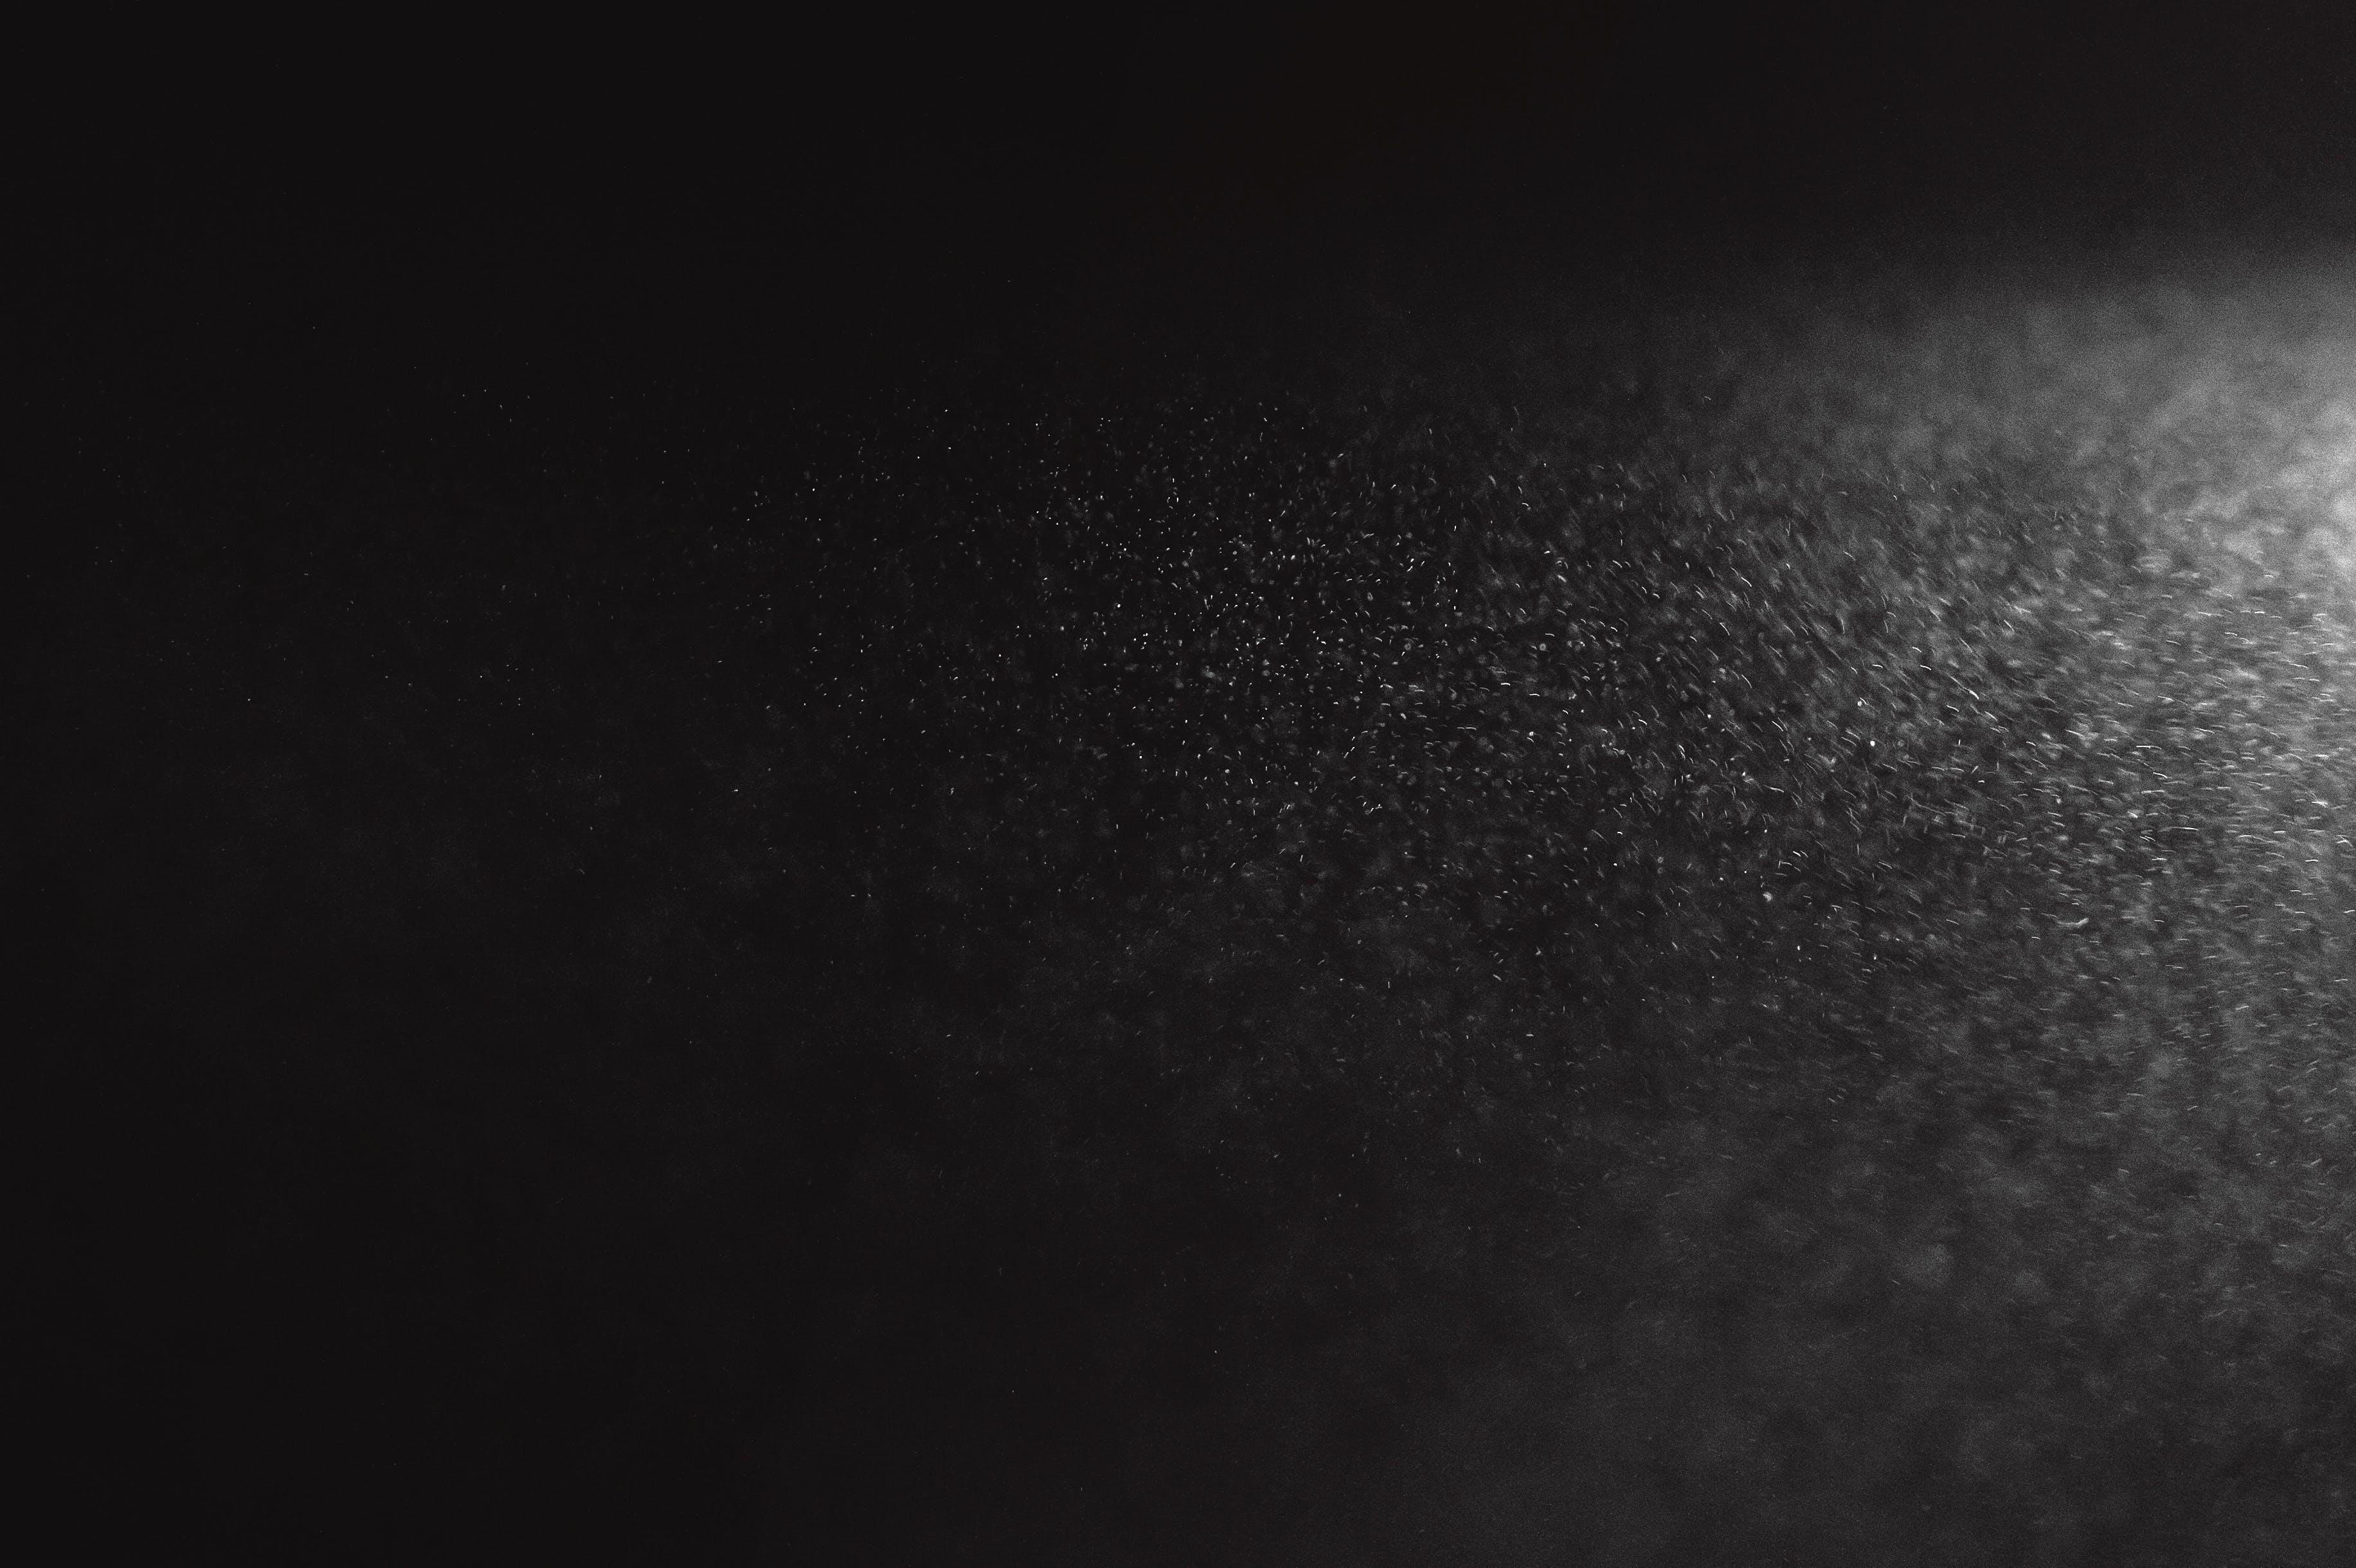 Free stock photo of cold, light, dark, dust